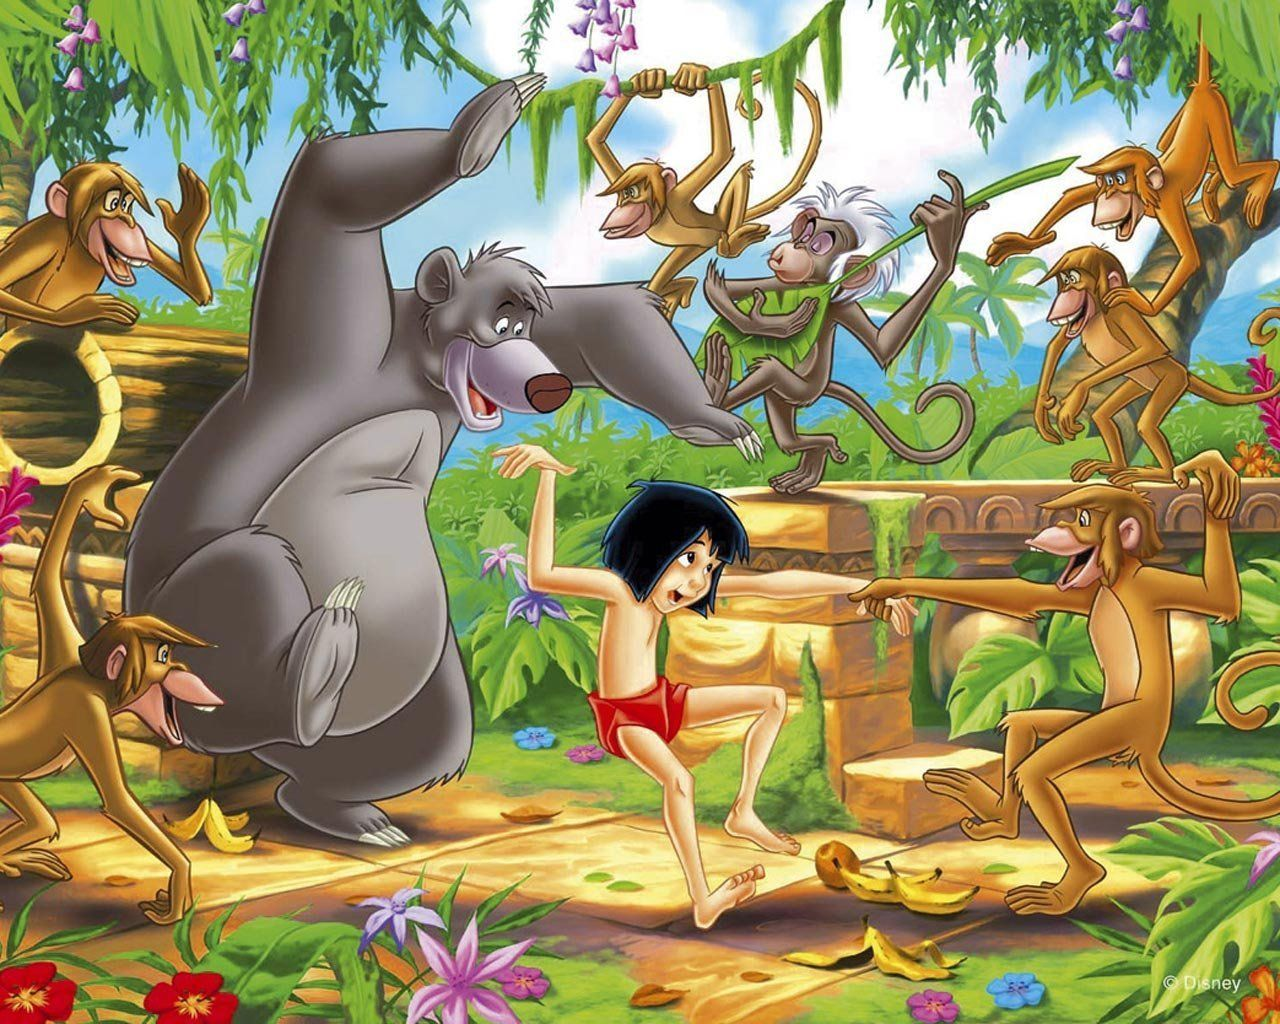 The Jungle Book Disney Wallpaper Jungle Book Jungle Book Disney